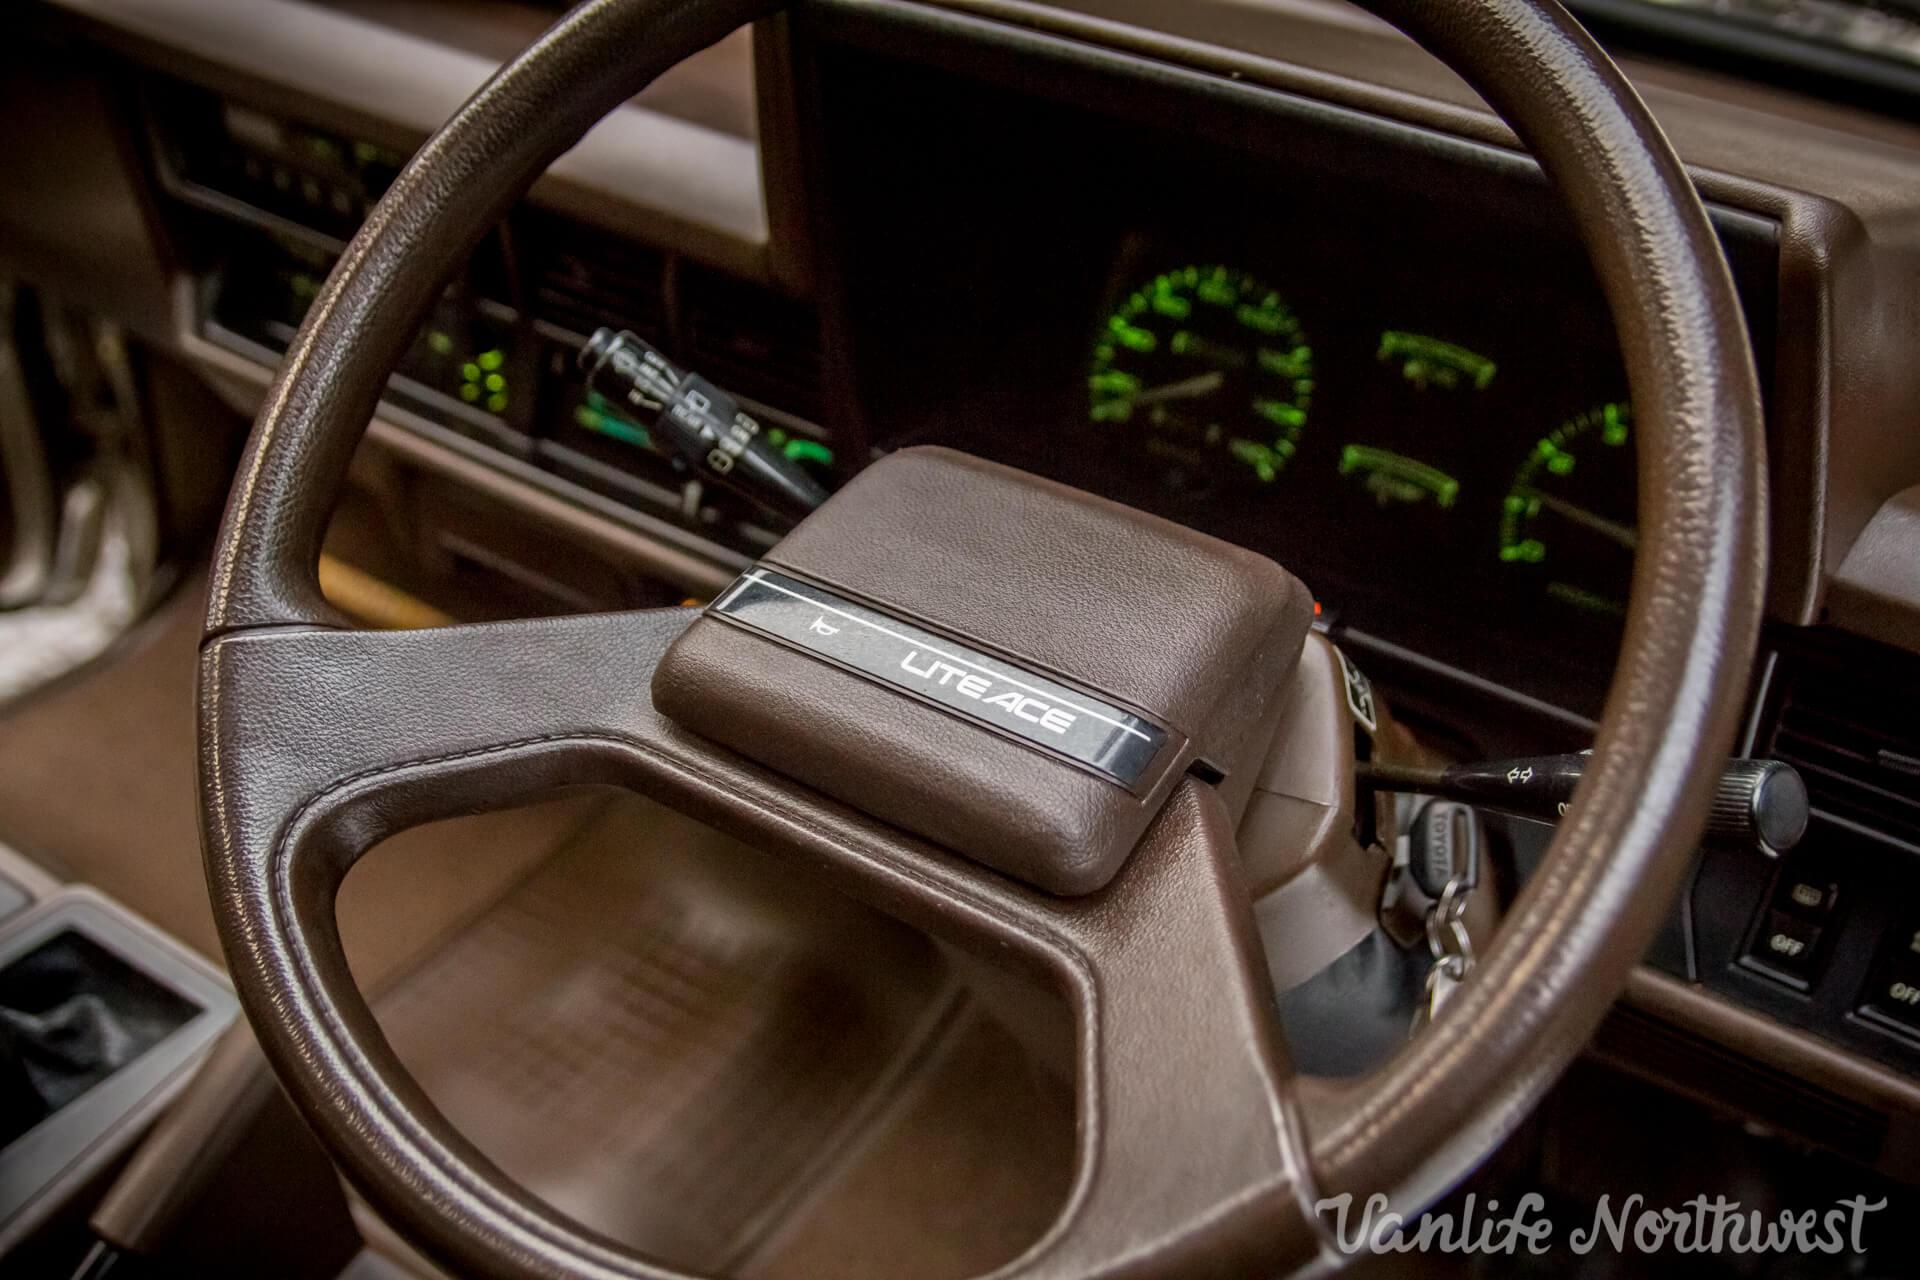 1988ToyotaLiteAceFXV4wdGasManual75k-30.jpg